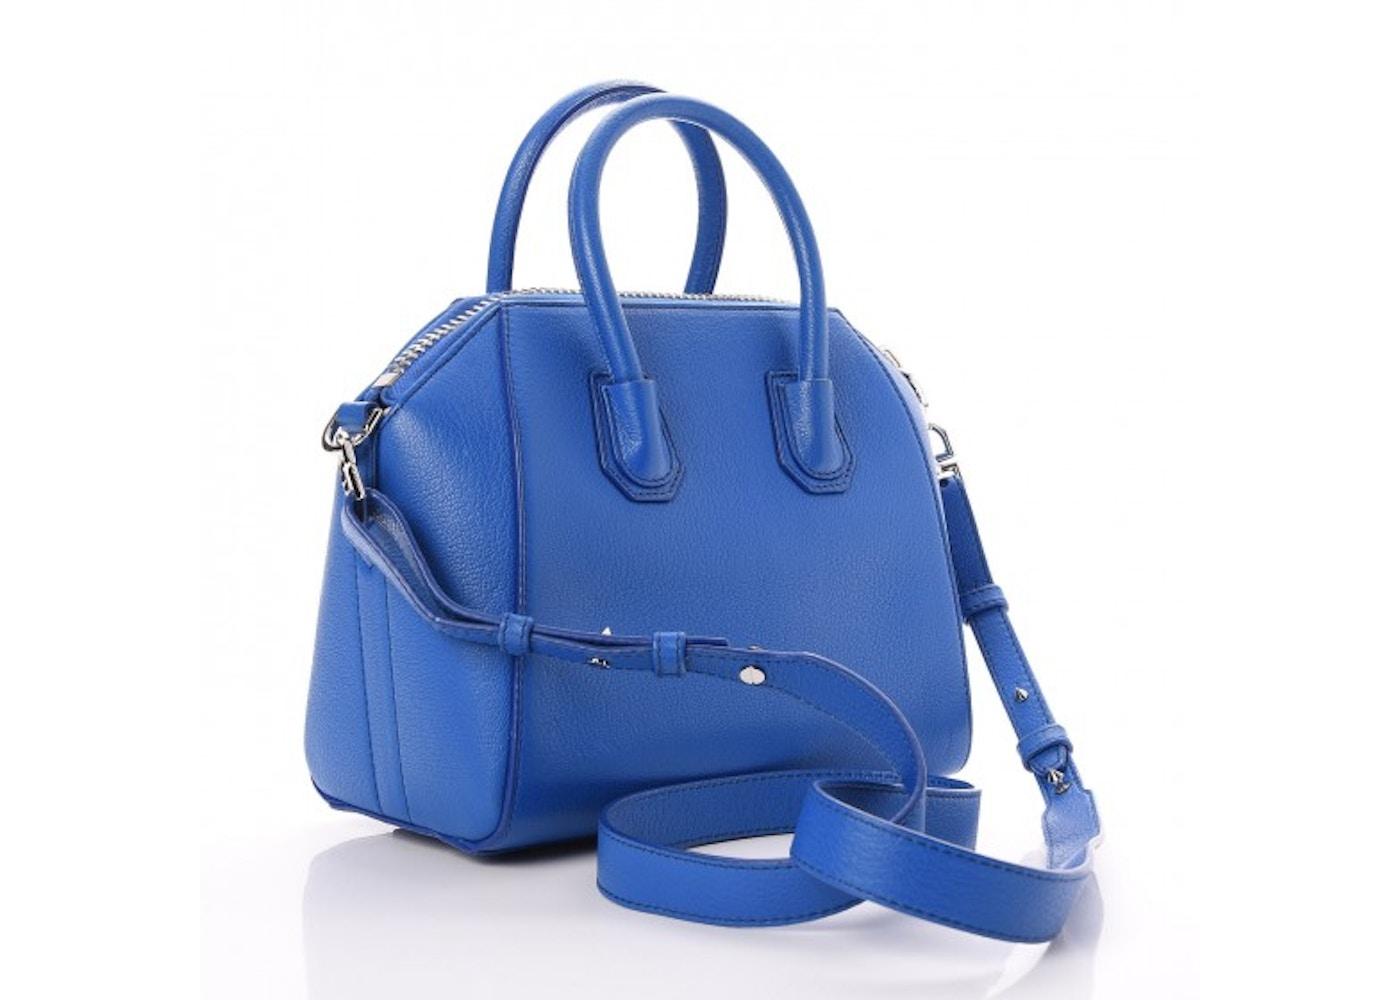 392aa480772a Buy   Sell Givenchy Antigona Handbags - Release Date